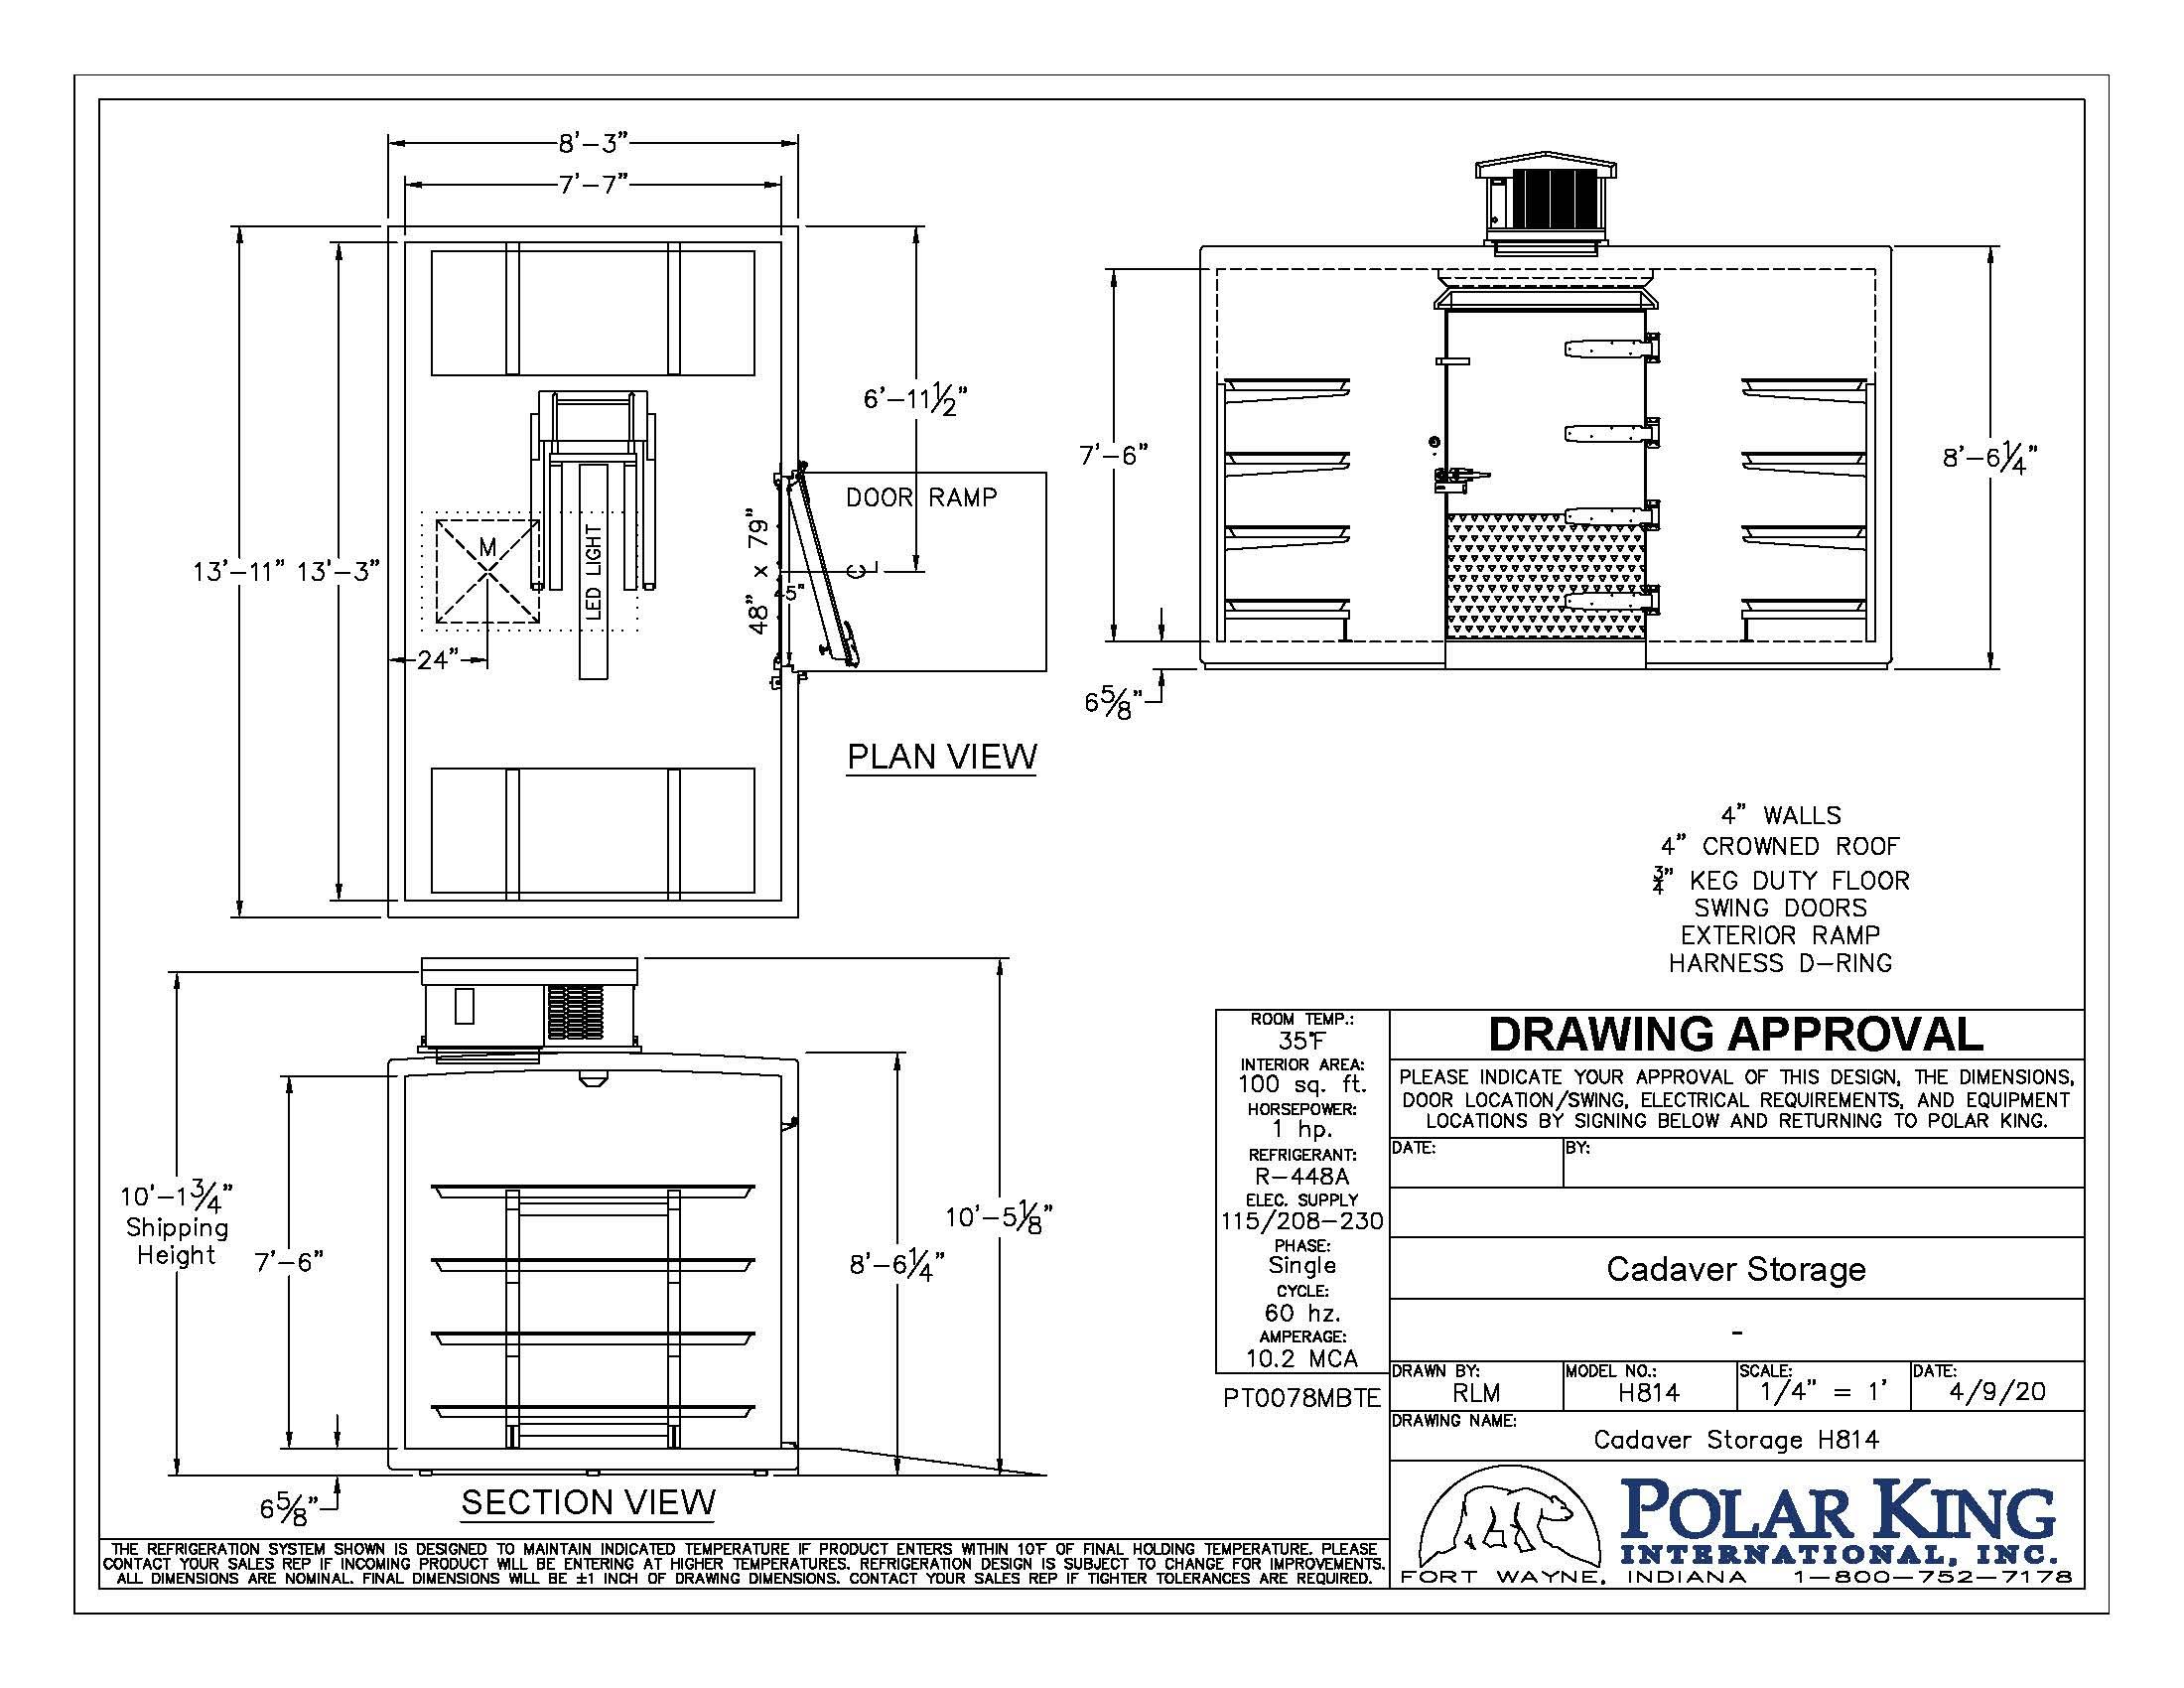 Black and white diagram of Cadaver Storage unit H814